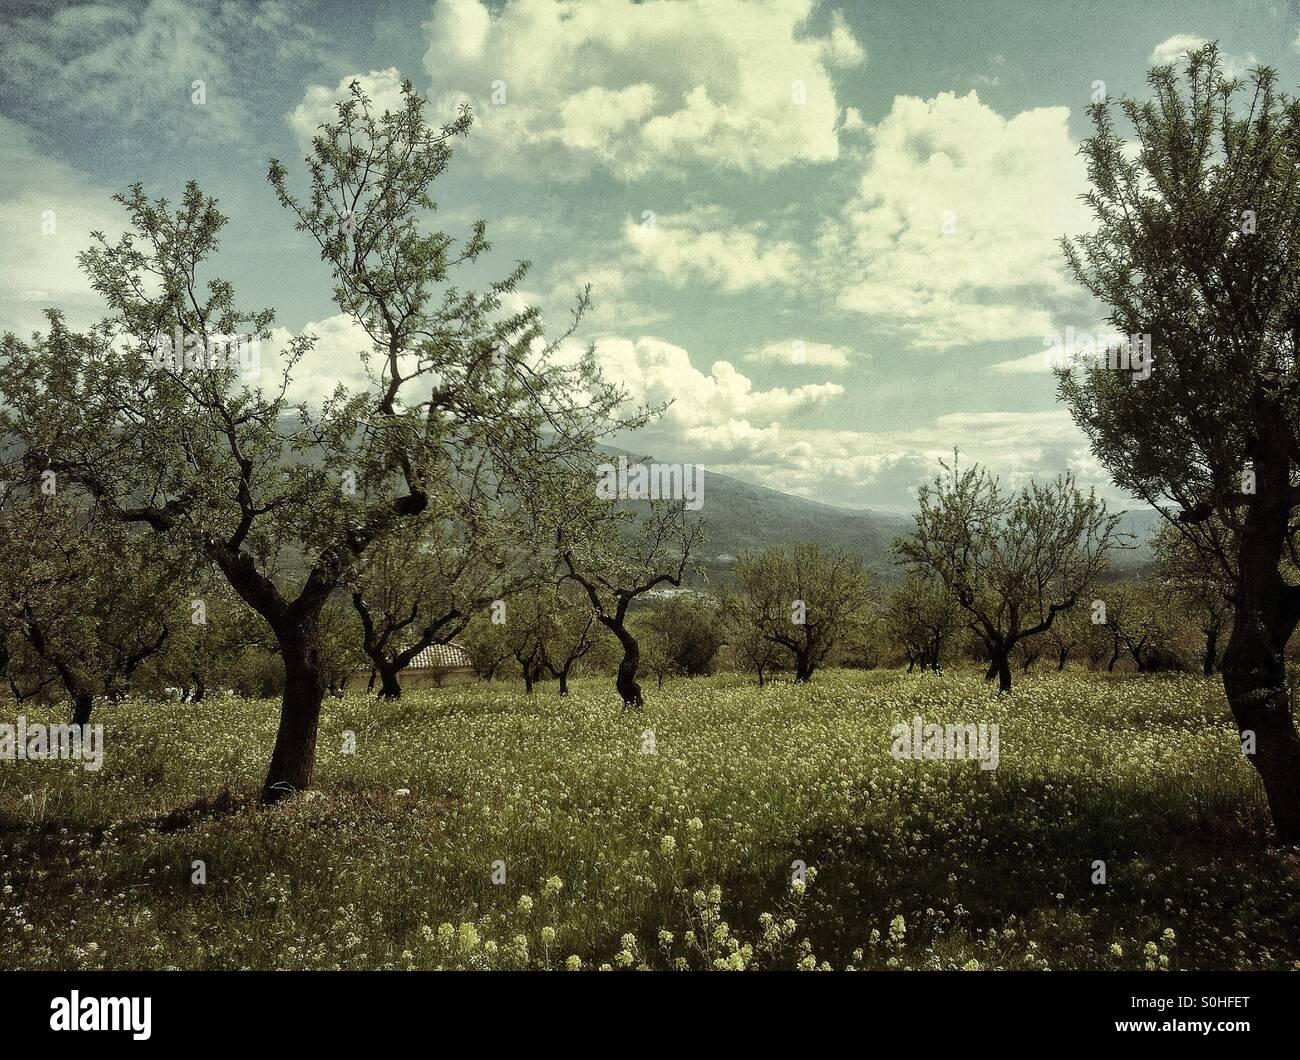 Olive grove in Spain - Stock Image